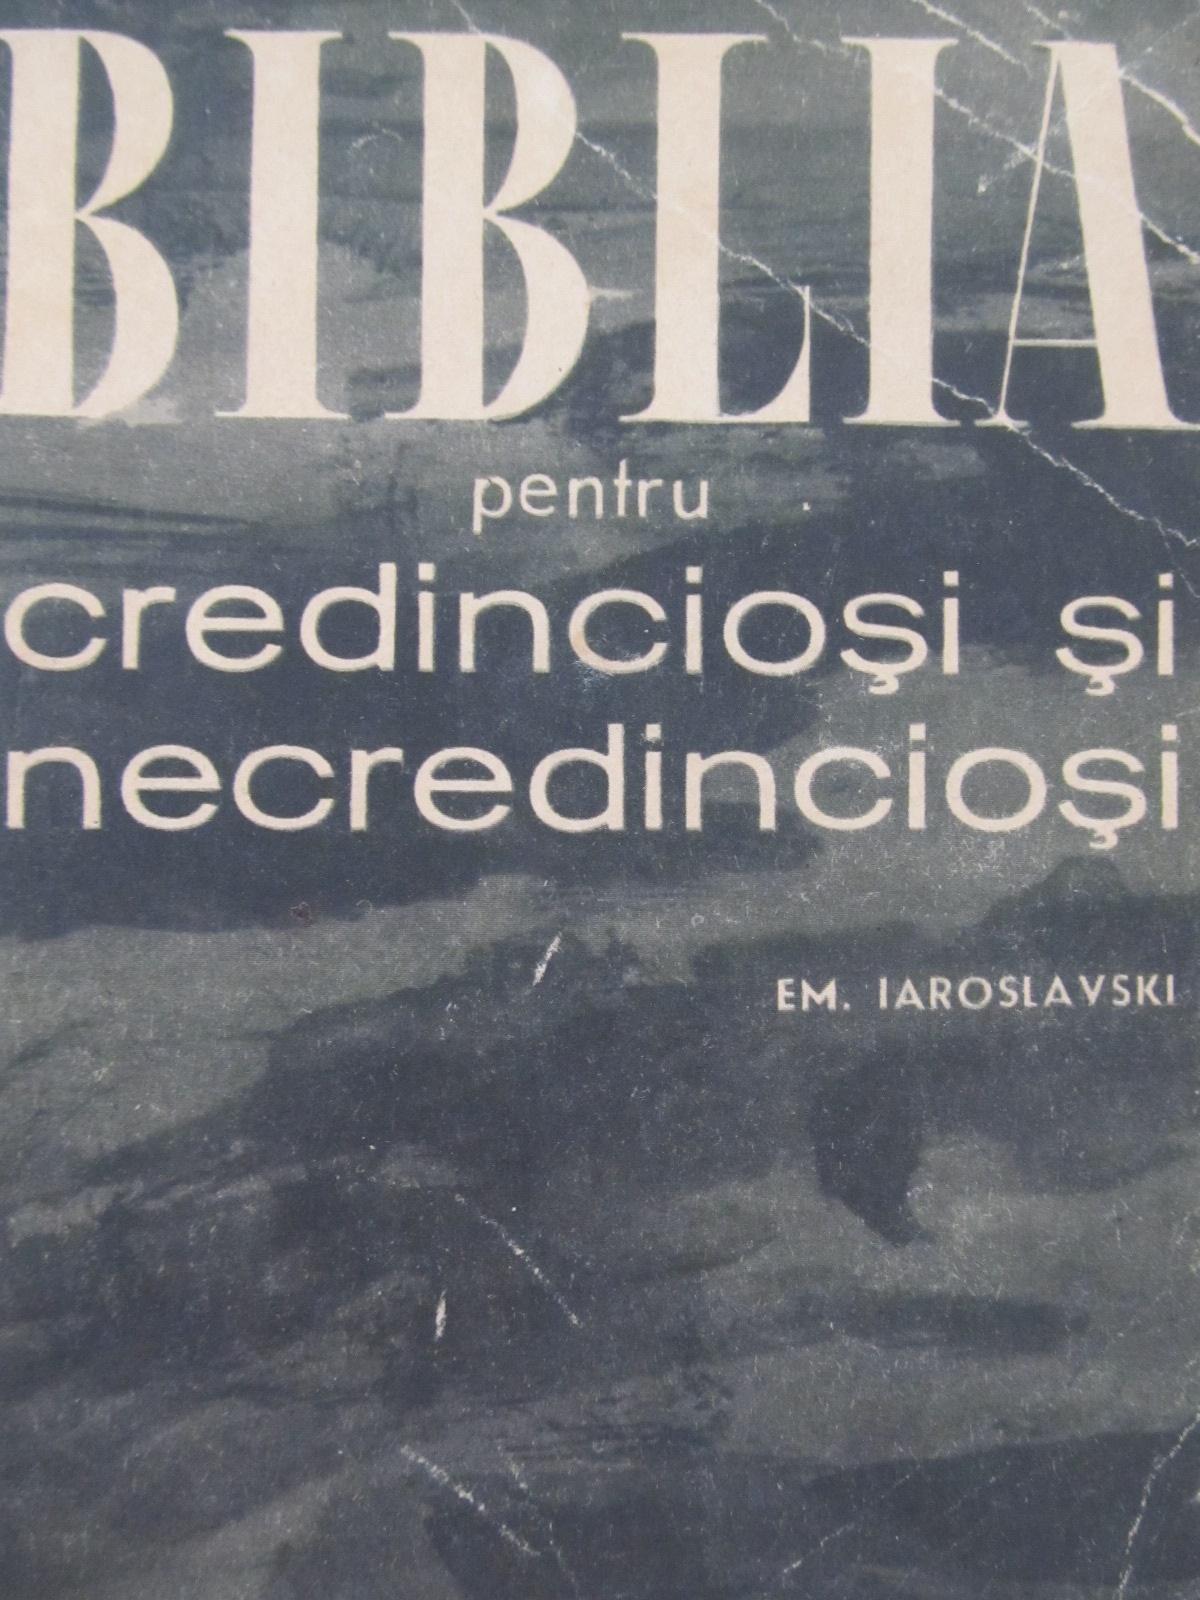 Biblia pentru credinciosi si necredinciosi - Em. Iaroslavski | Detalii carte